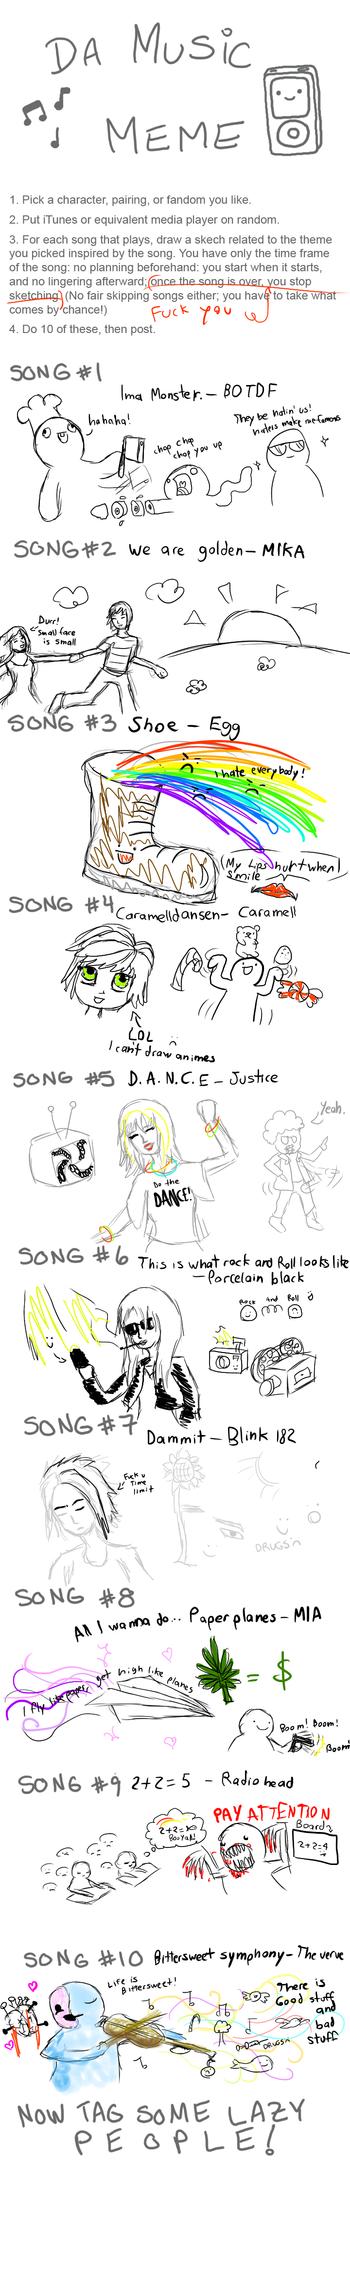 My music meme by aribel